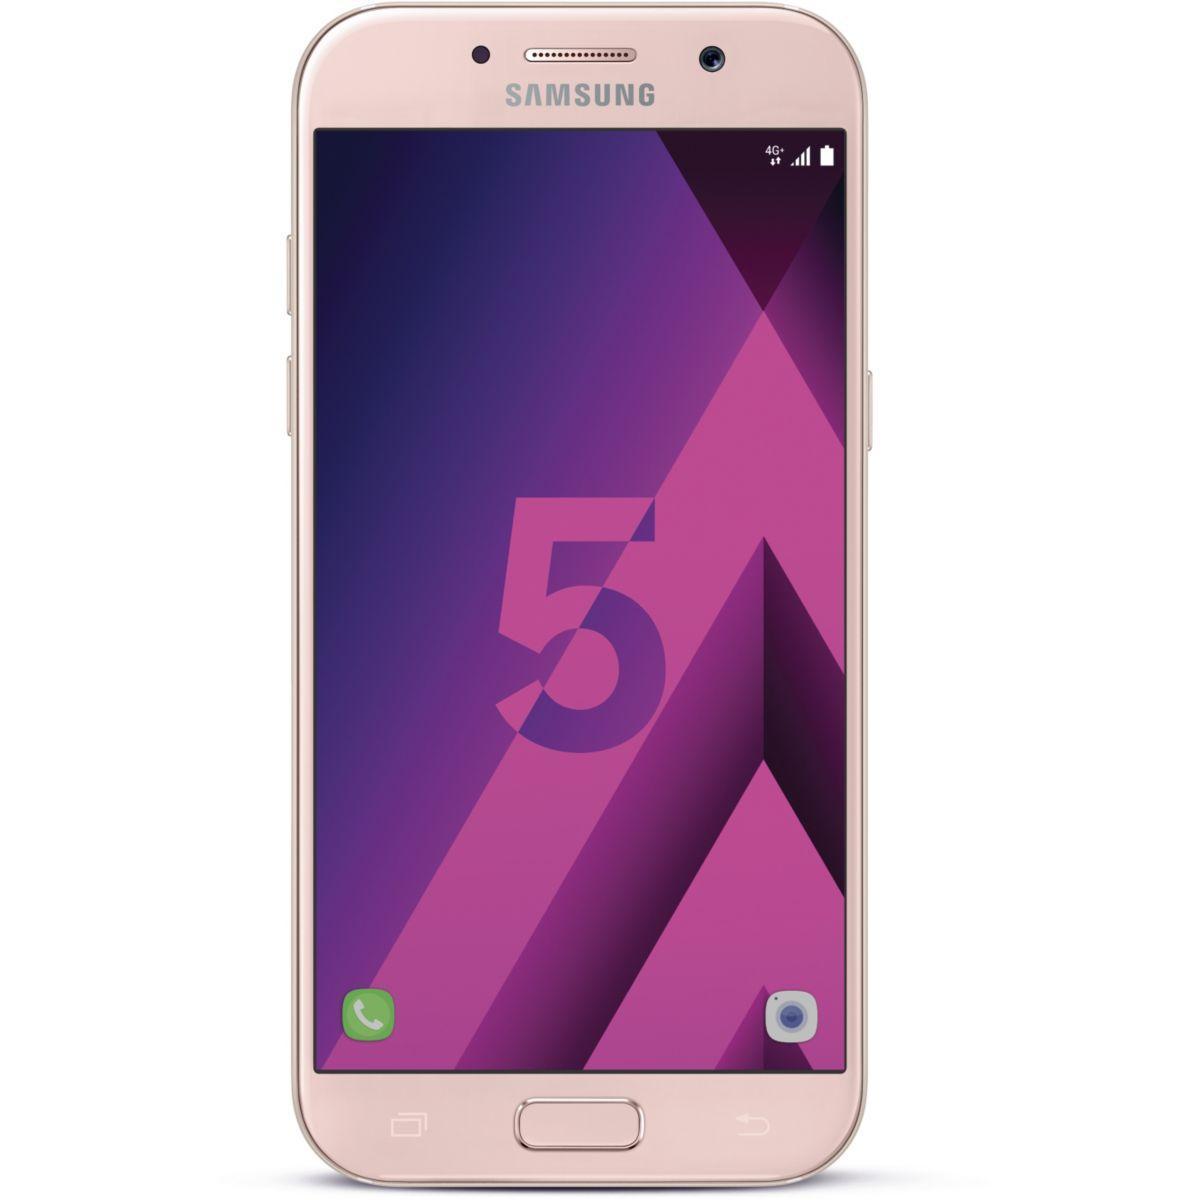 Smartphone samsung galaxy a5 rose ed.2017 - la sélection de l'équipe